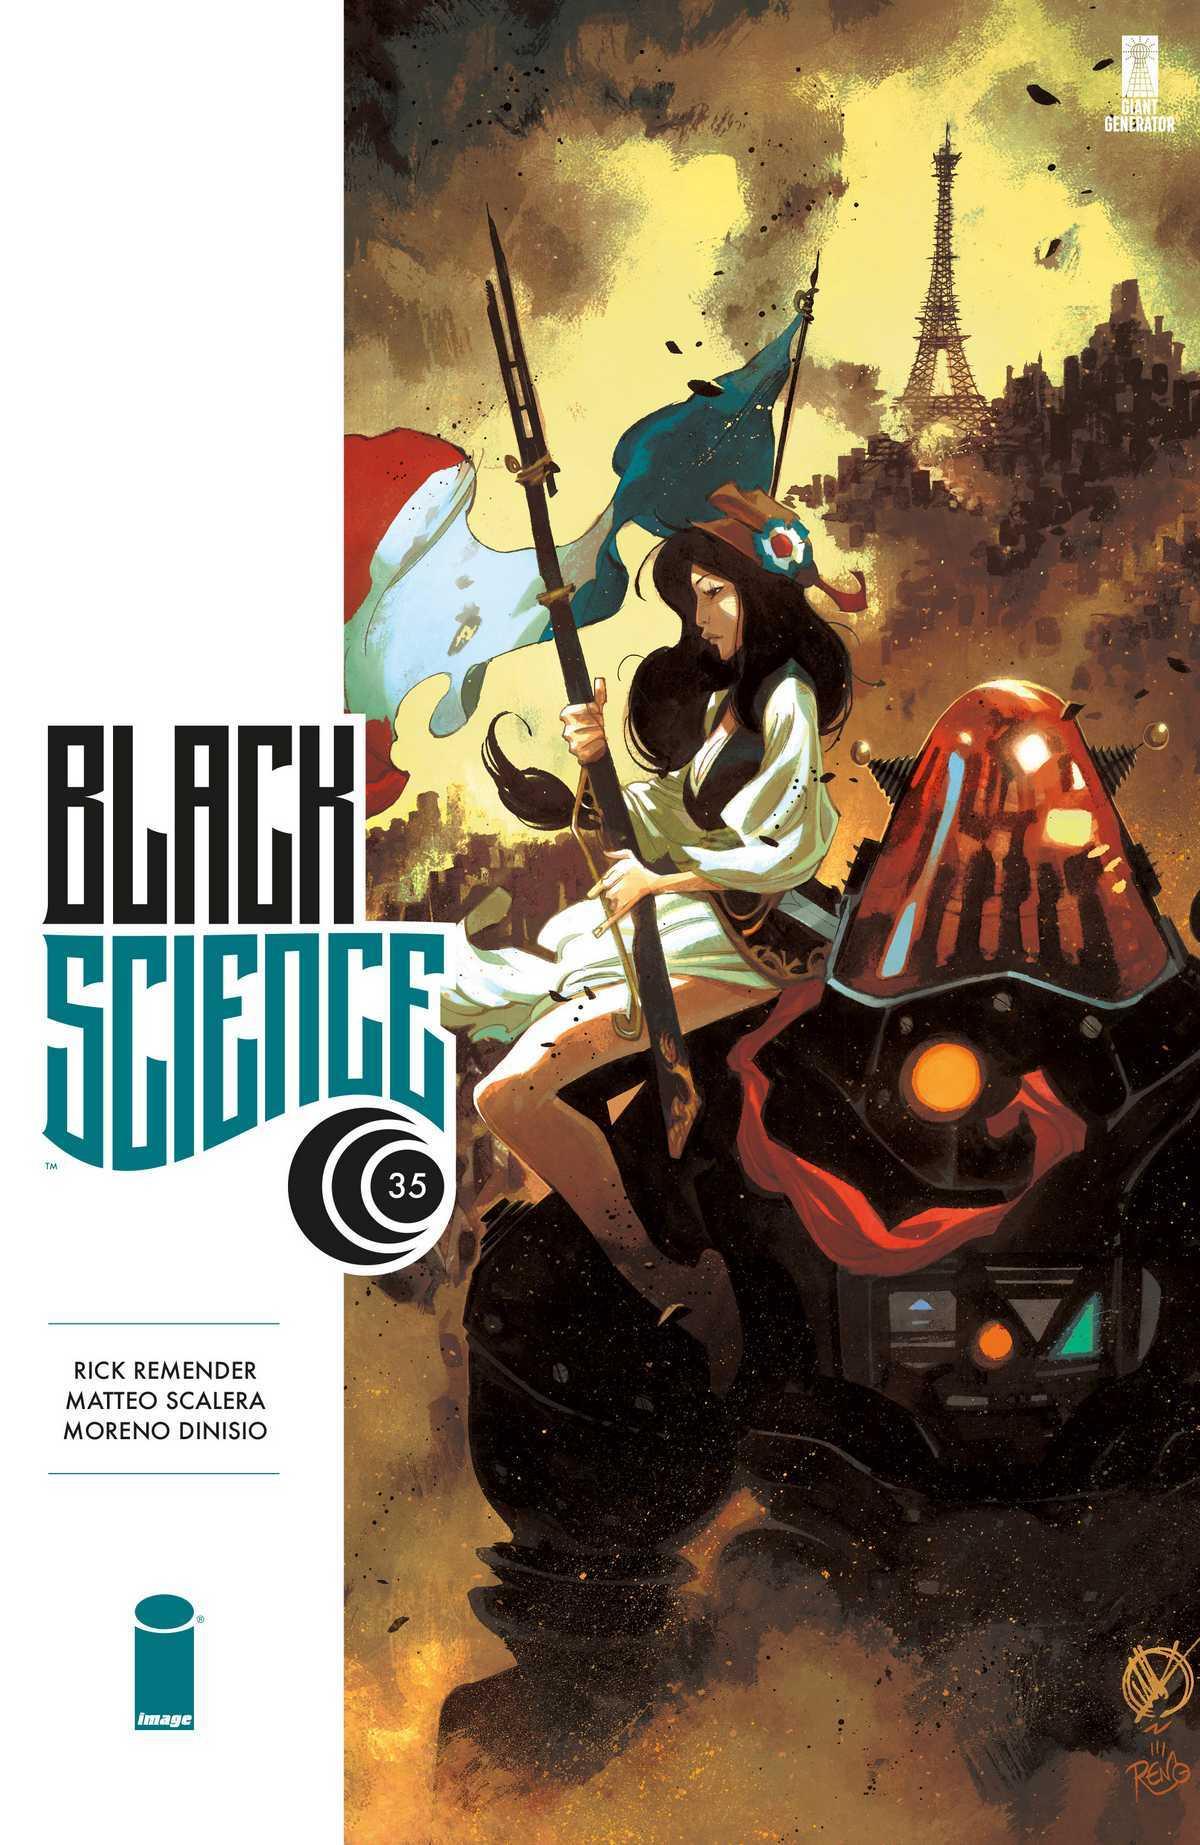 Black Science #35